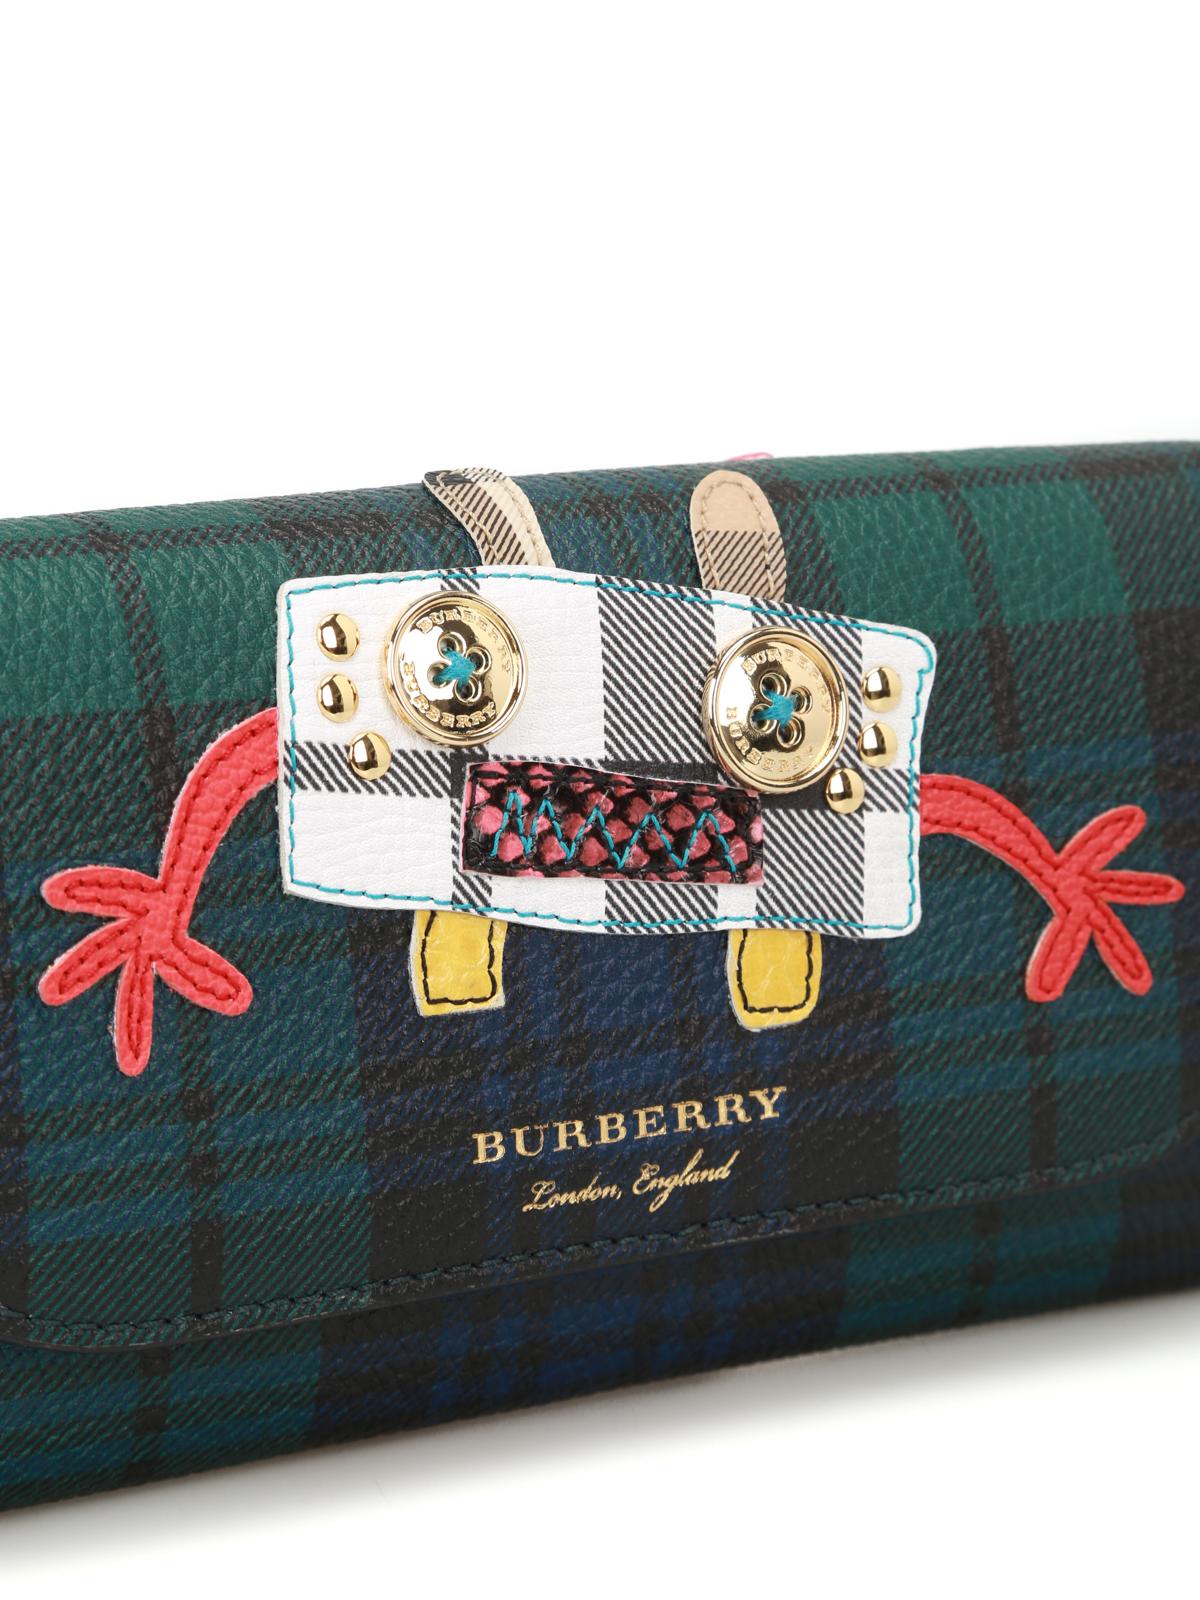 c229e8c5ba Burberry - Borsa portafoglio Henley scozzese - pochette - 4068559